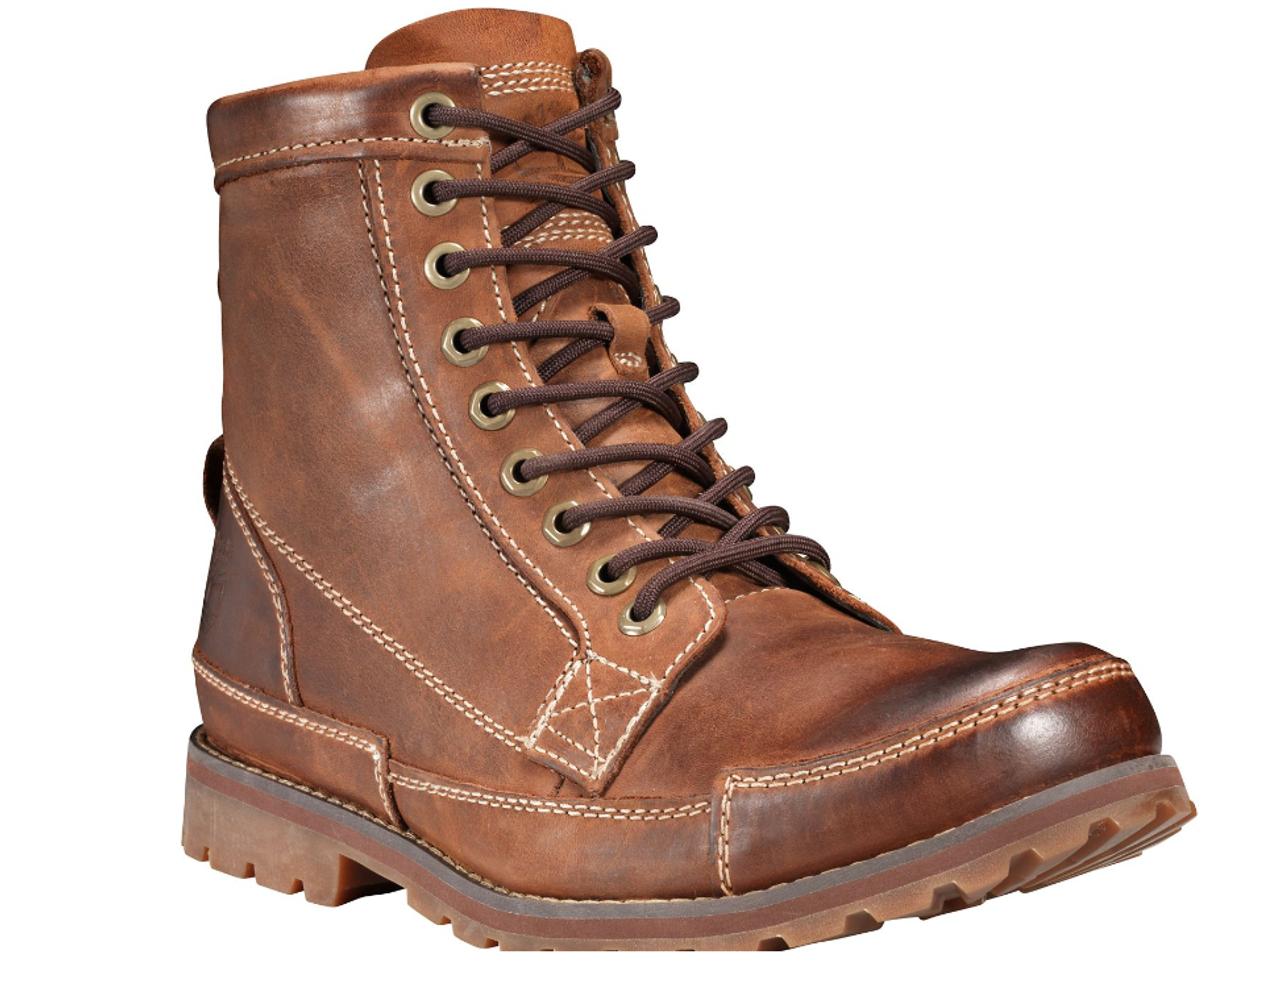 på grossist riktigt bekvämt presenter Men's Timberland Earthkeepers Original Leather Boot - Herbert's ...